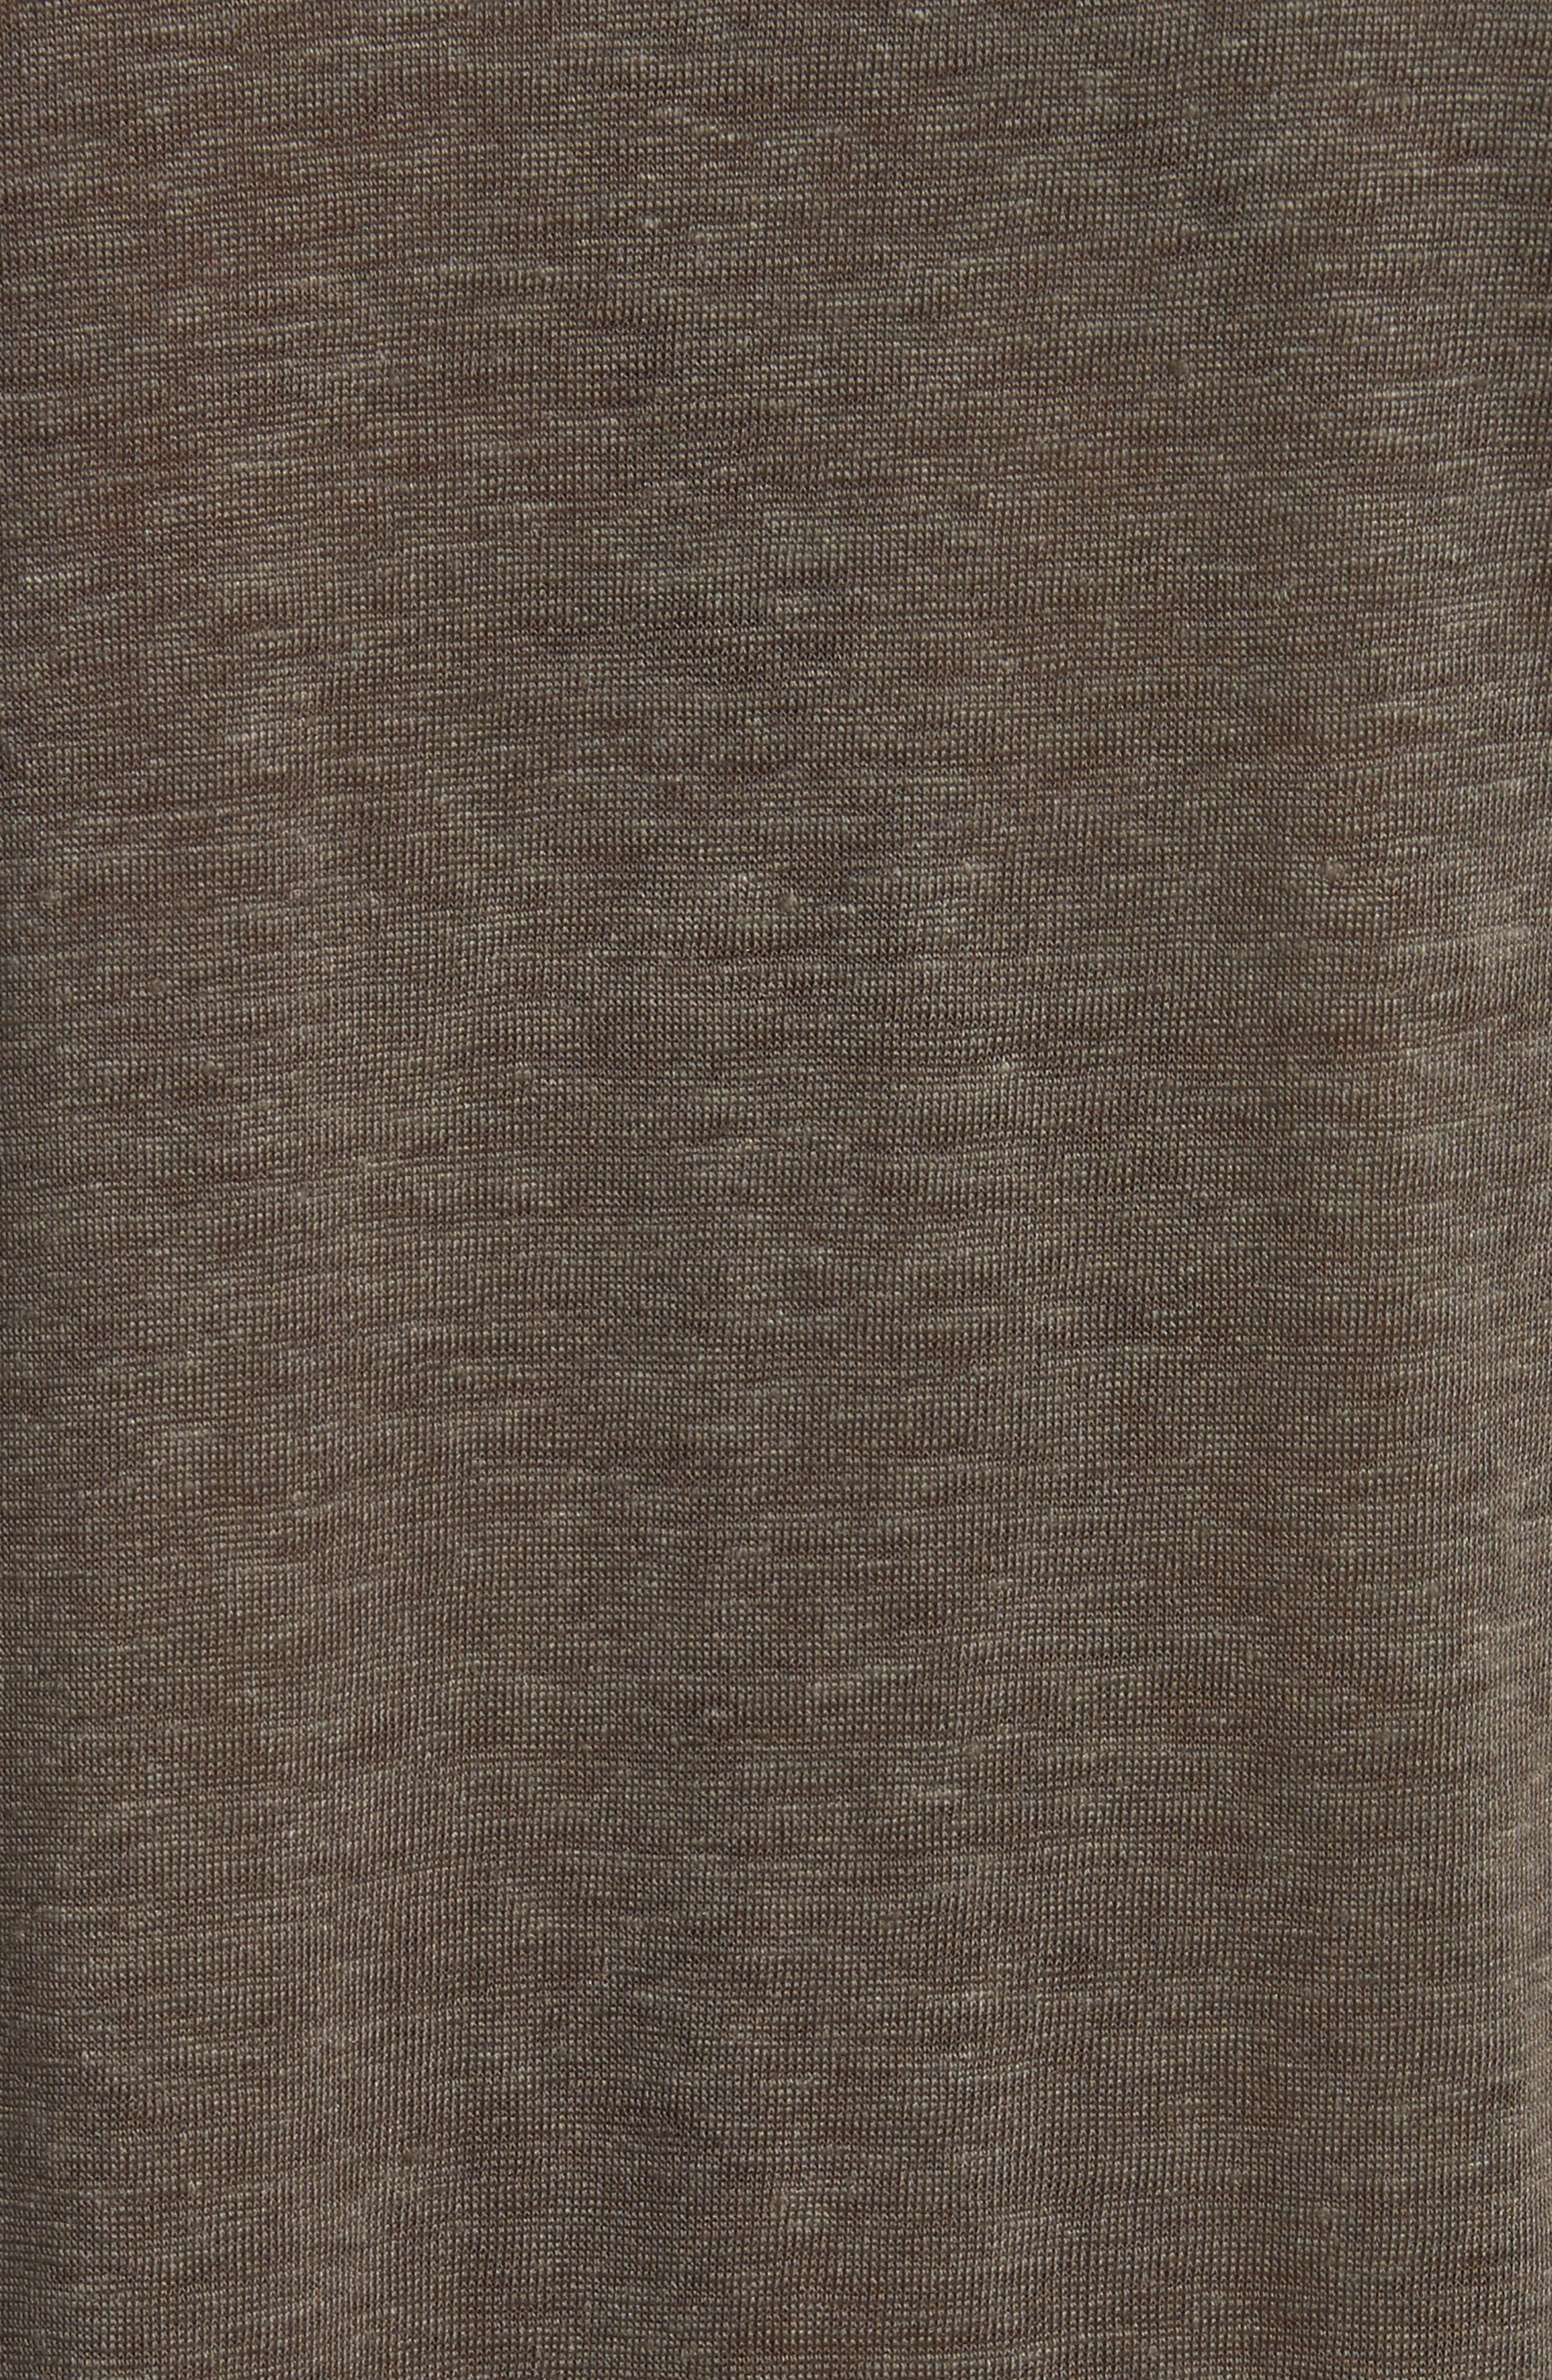 Linen Henley T-Shirt,                             Alternate thumbnail 5, color,                             336